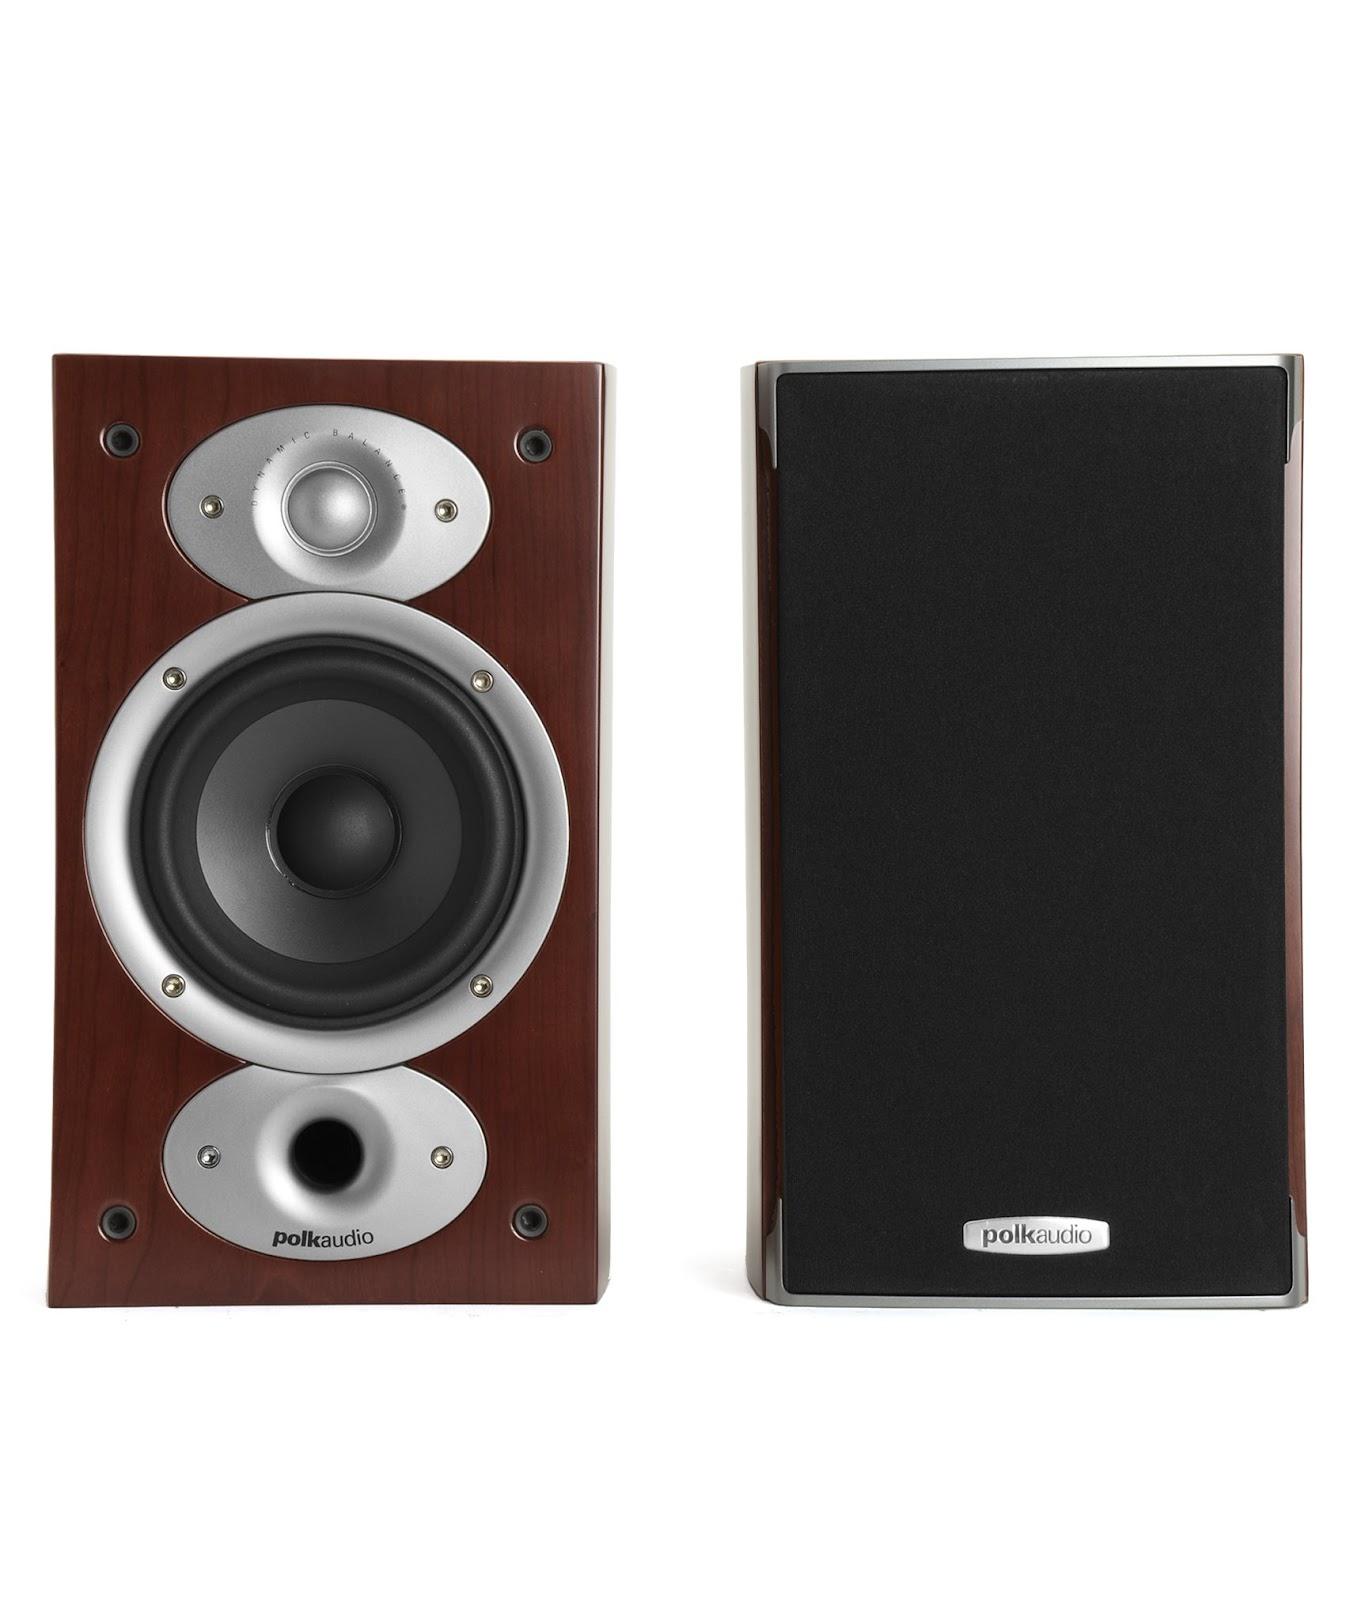 Amply Denon X1600H + Bộ Loa Polk Audio A5 rất sang trọng - 4